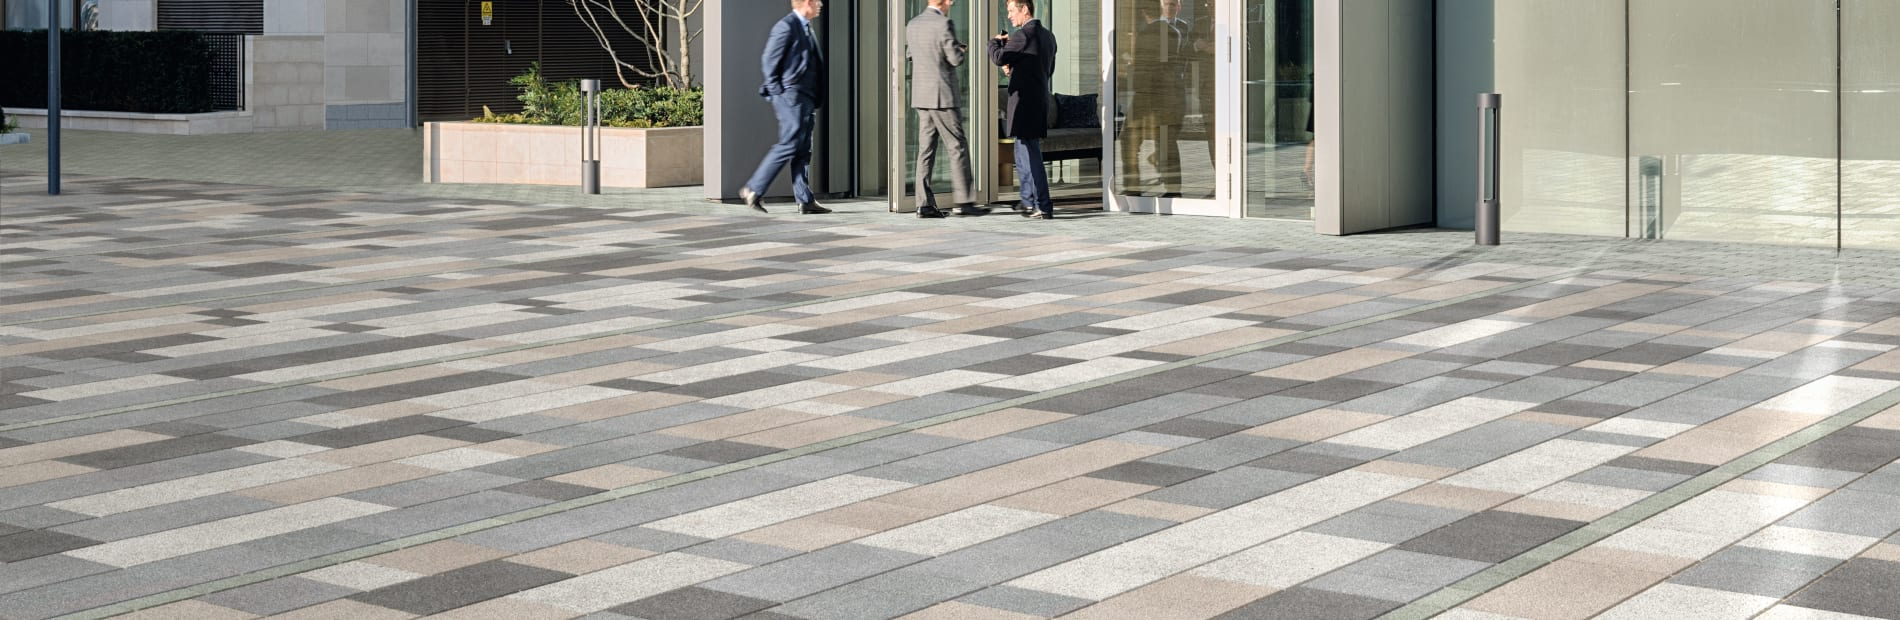 modal paving - mid grey granite